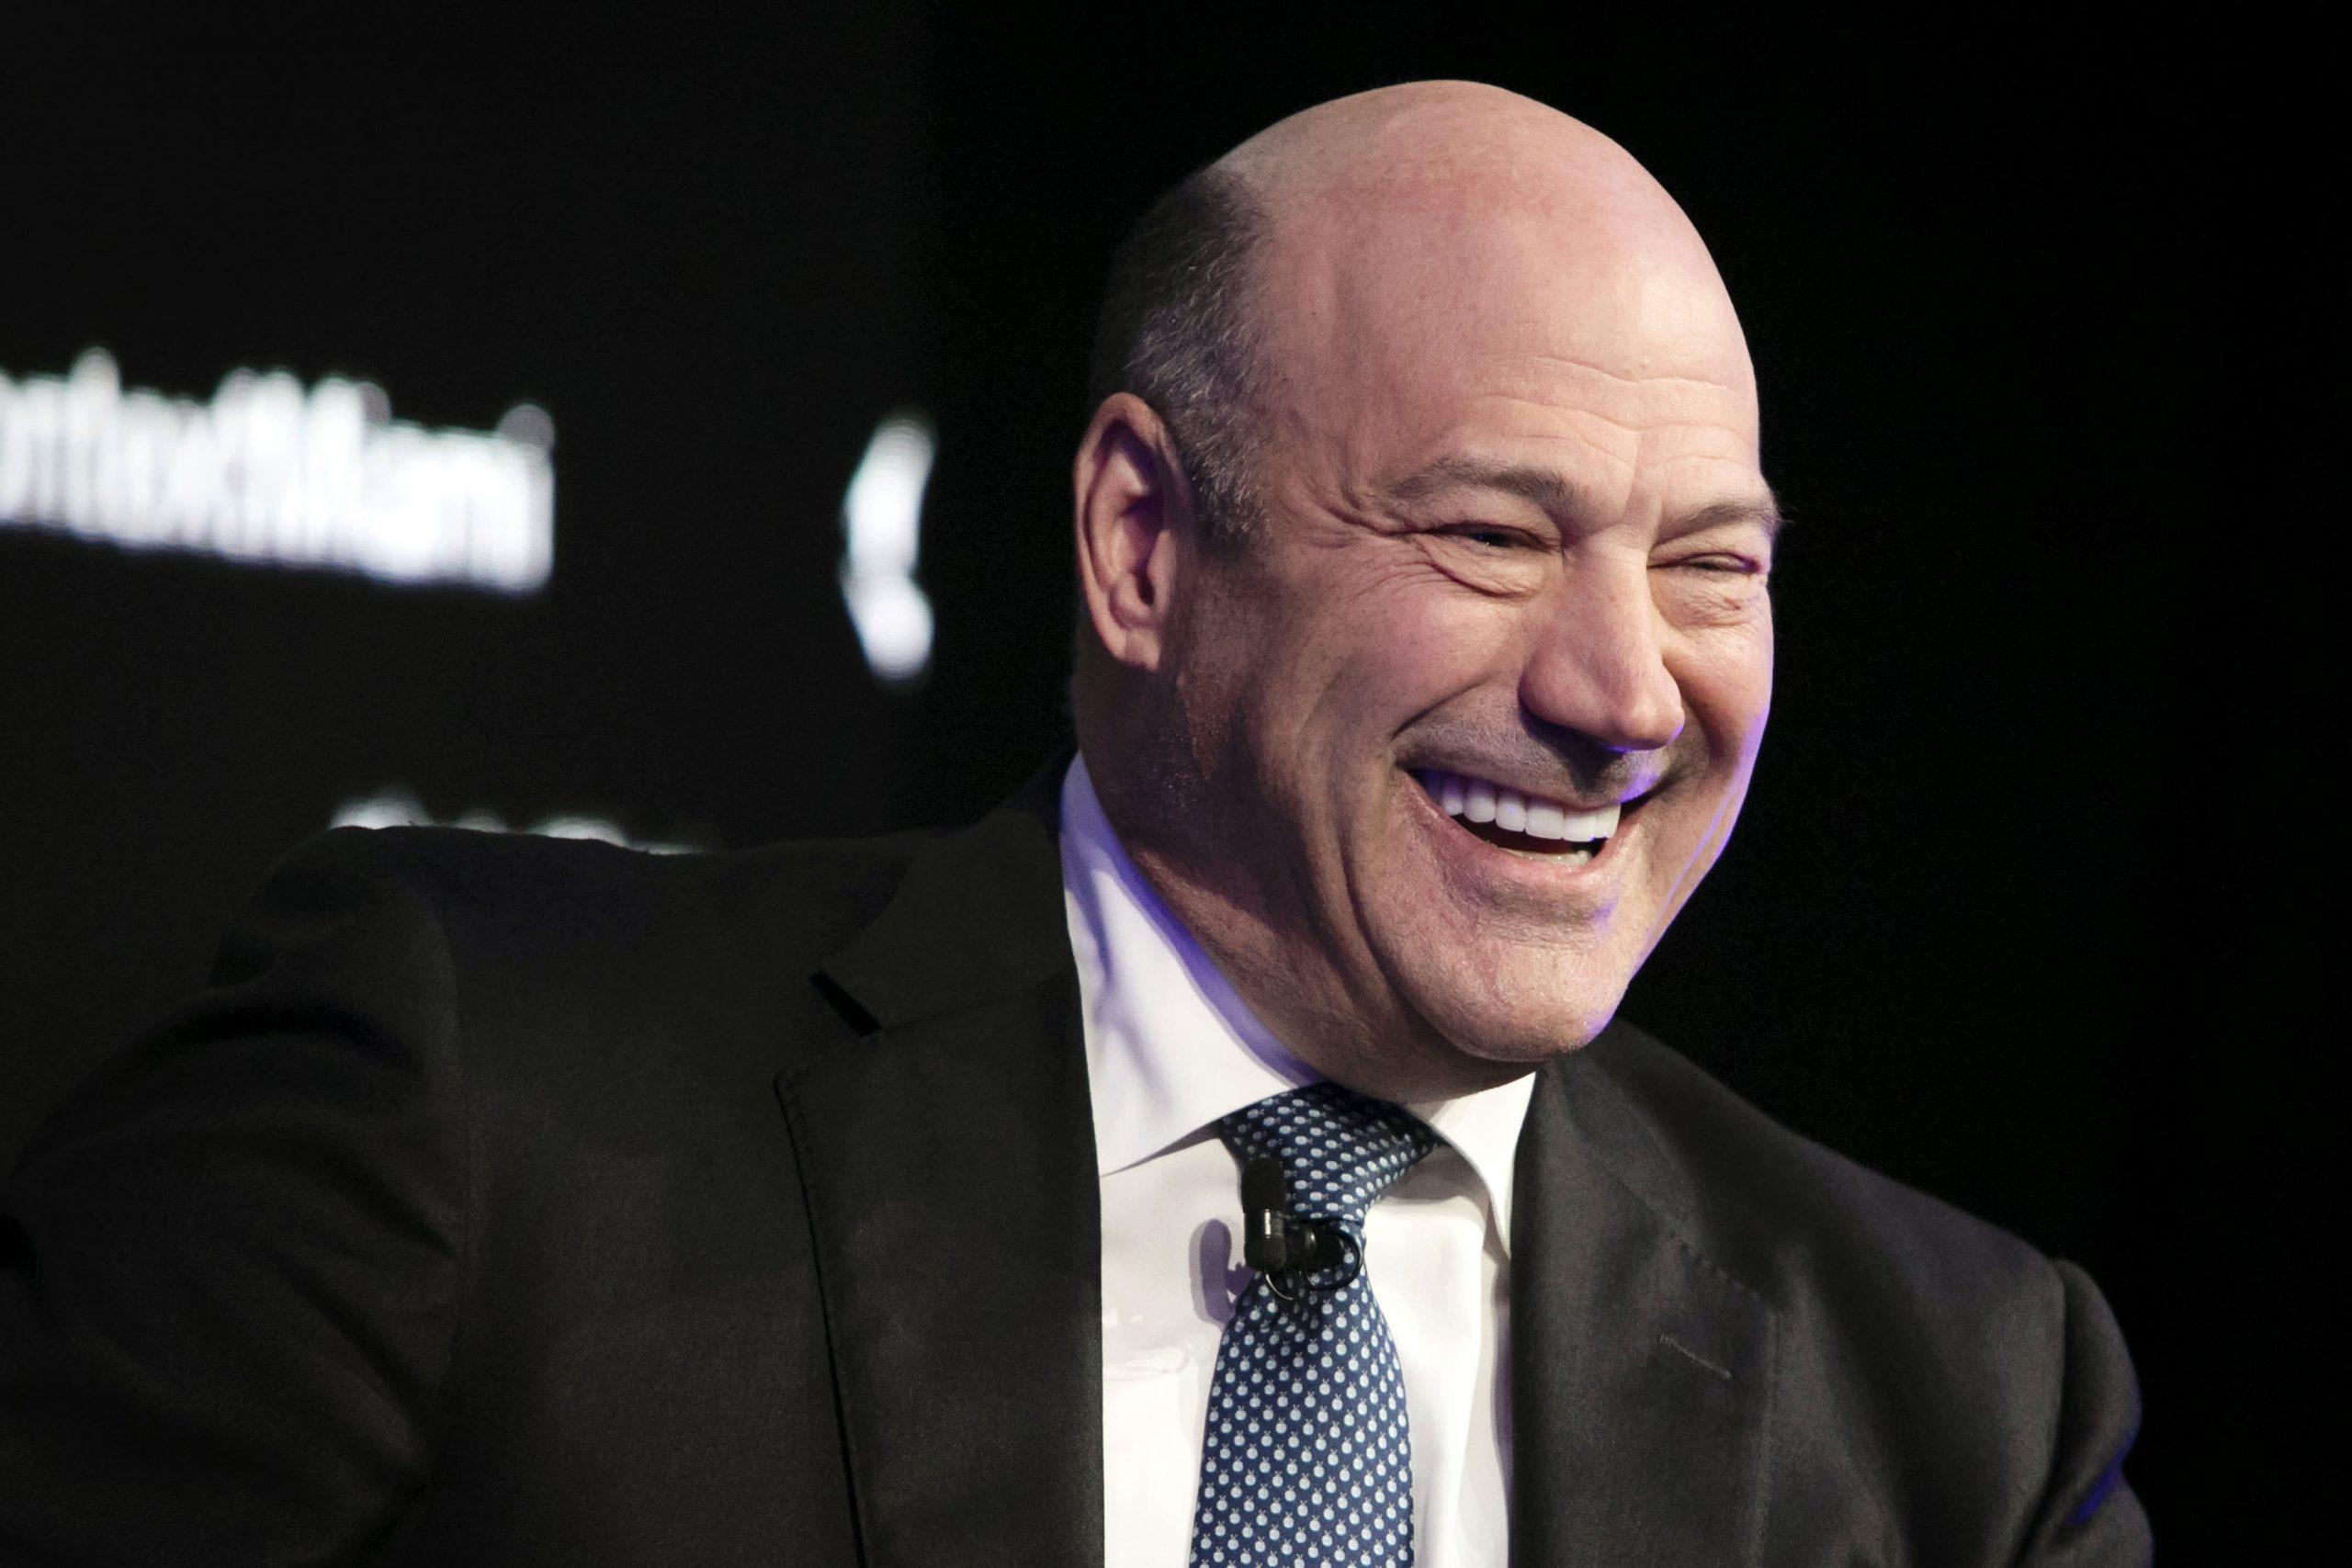 Gary Cohn joins IBM as Vice Chairman